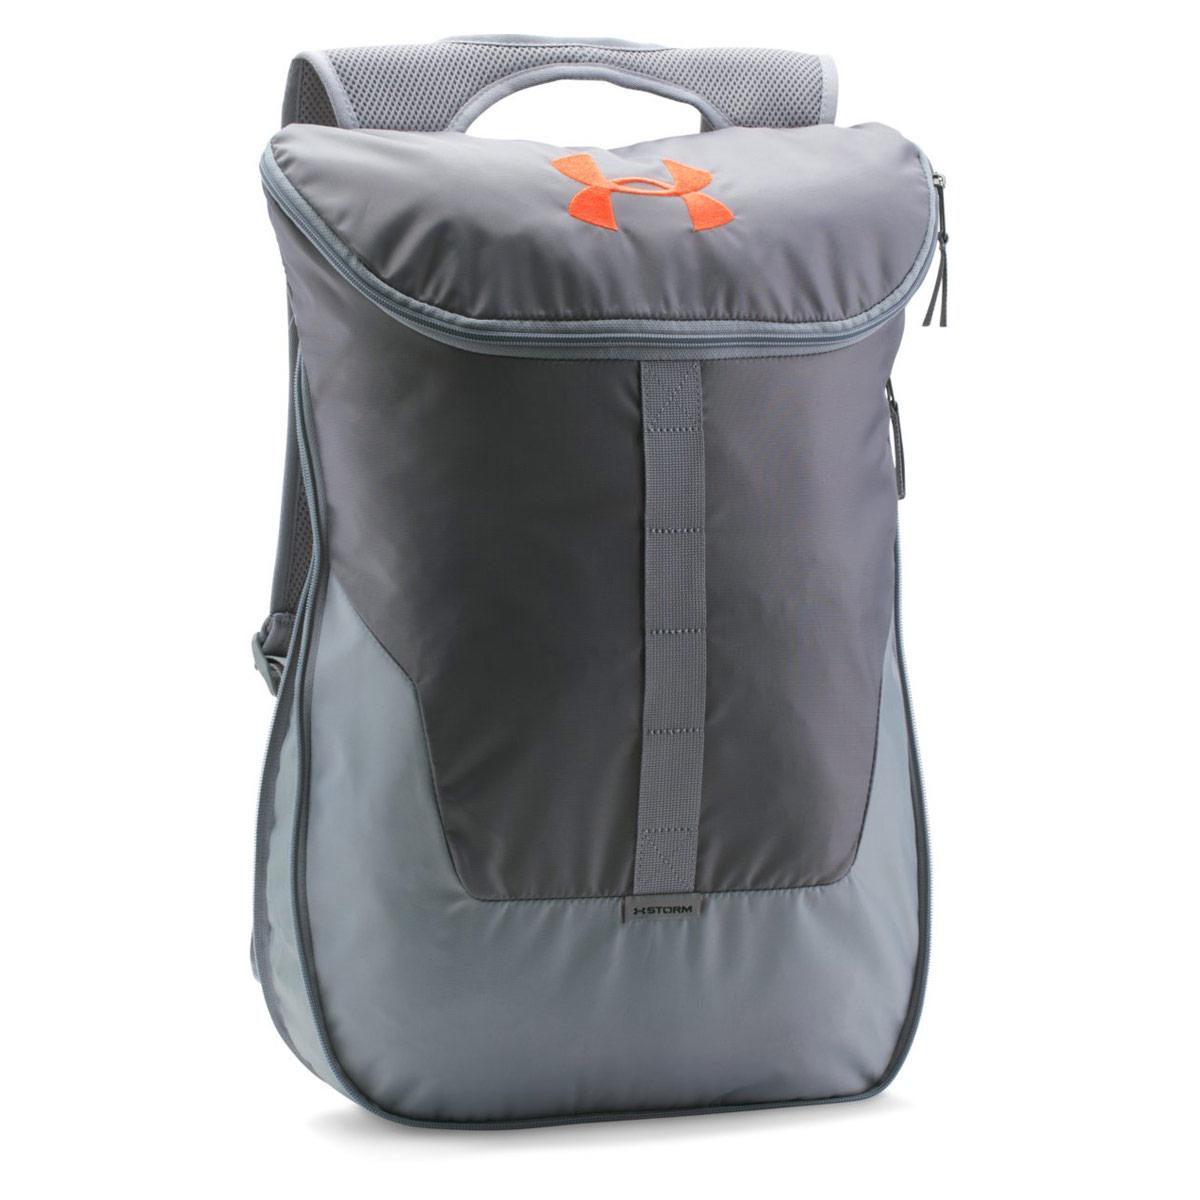 4abd7e336e1 Under Armour Expandable Sackpack - Backpacks - Grey | 21RUN